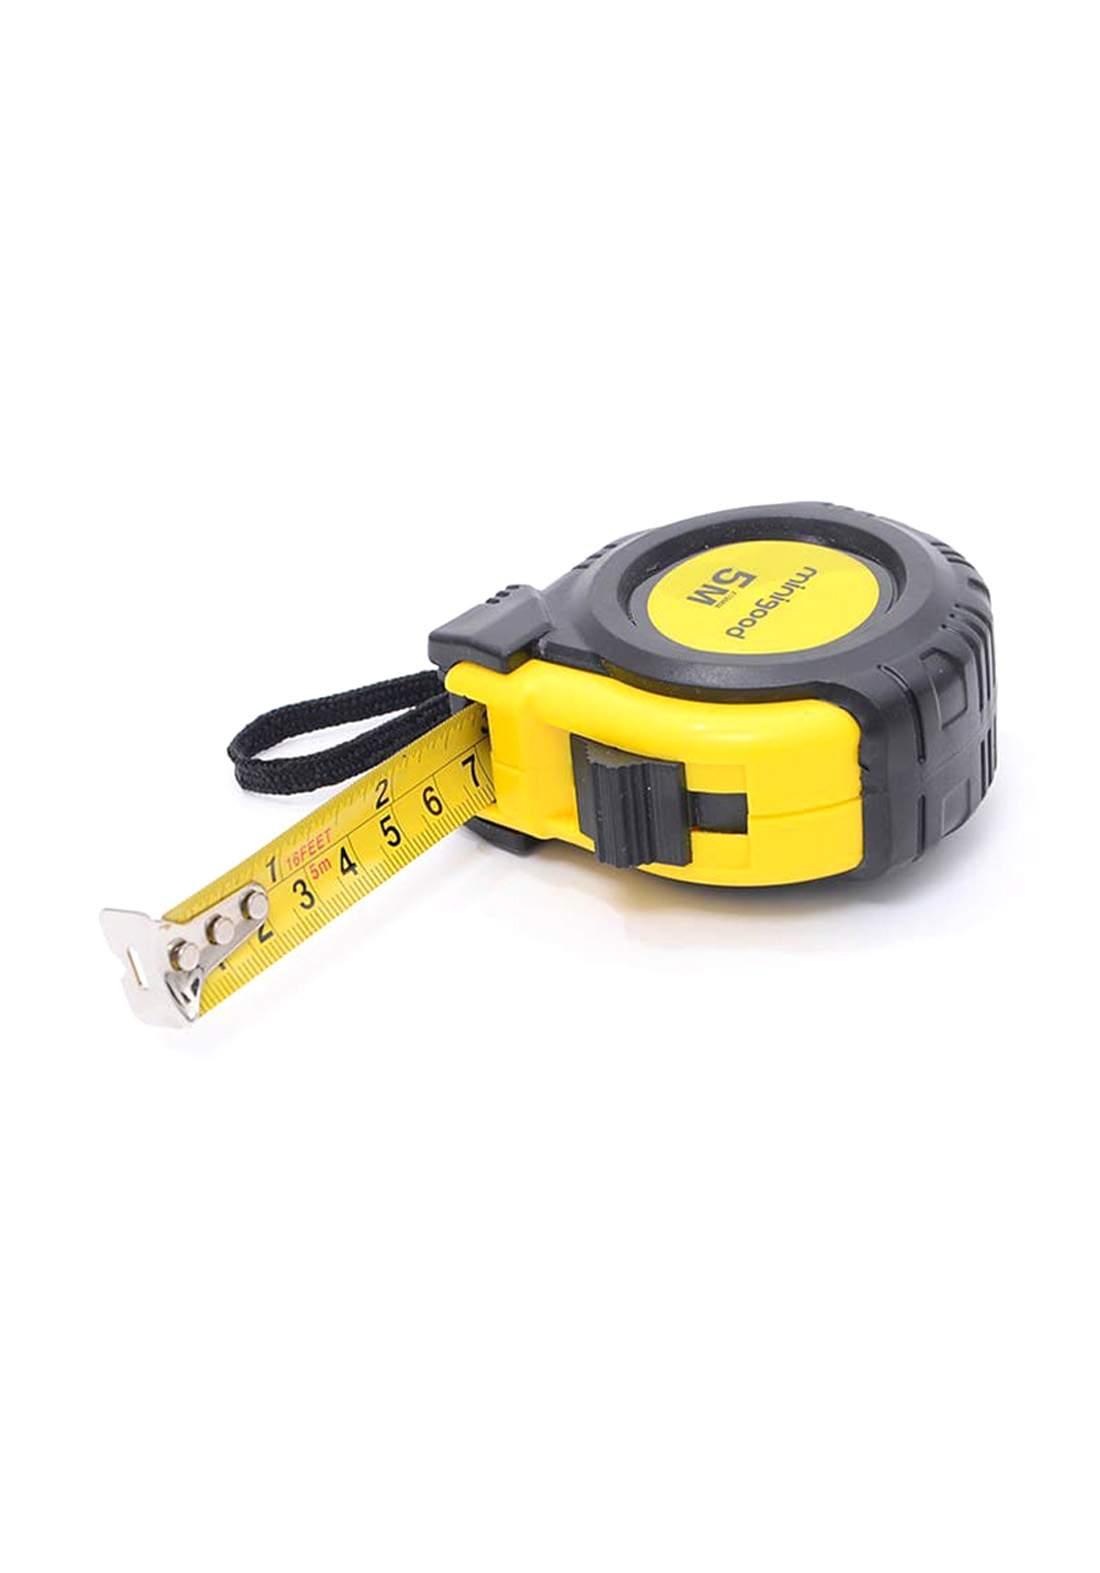 Minigoods Measuring Tape 5 m فيتة